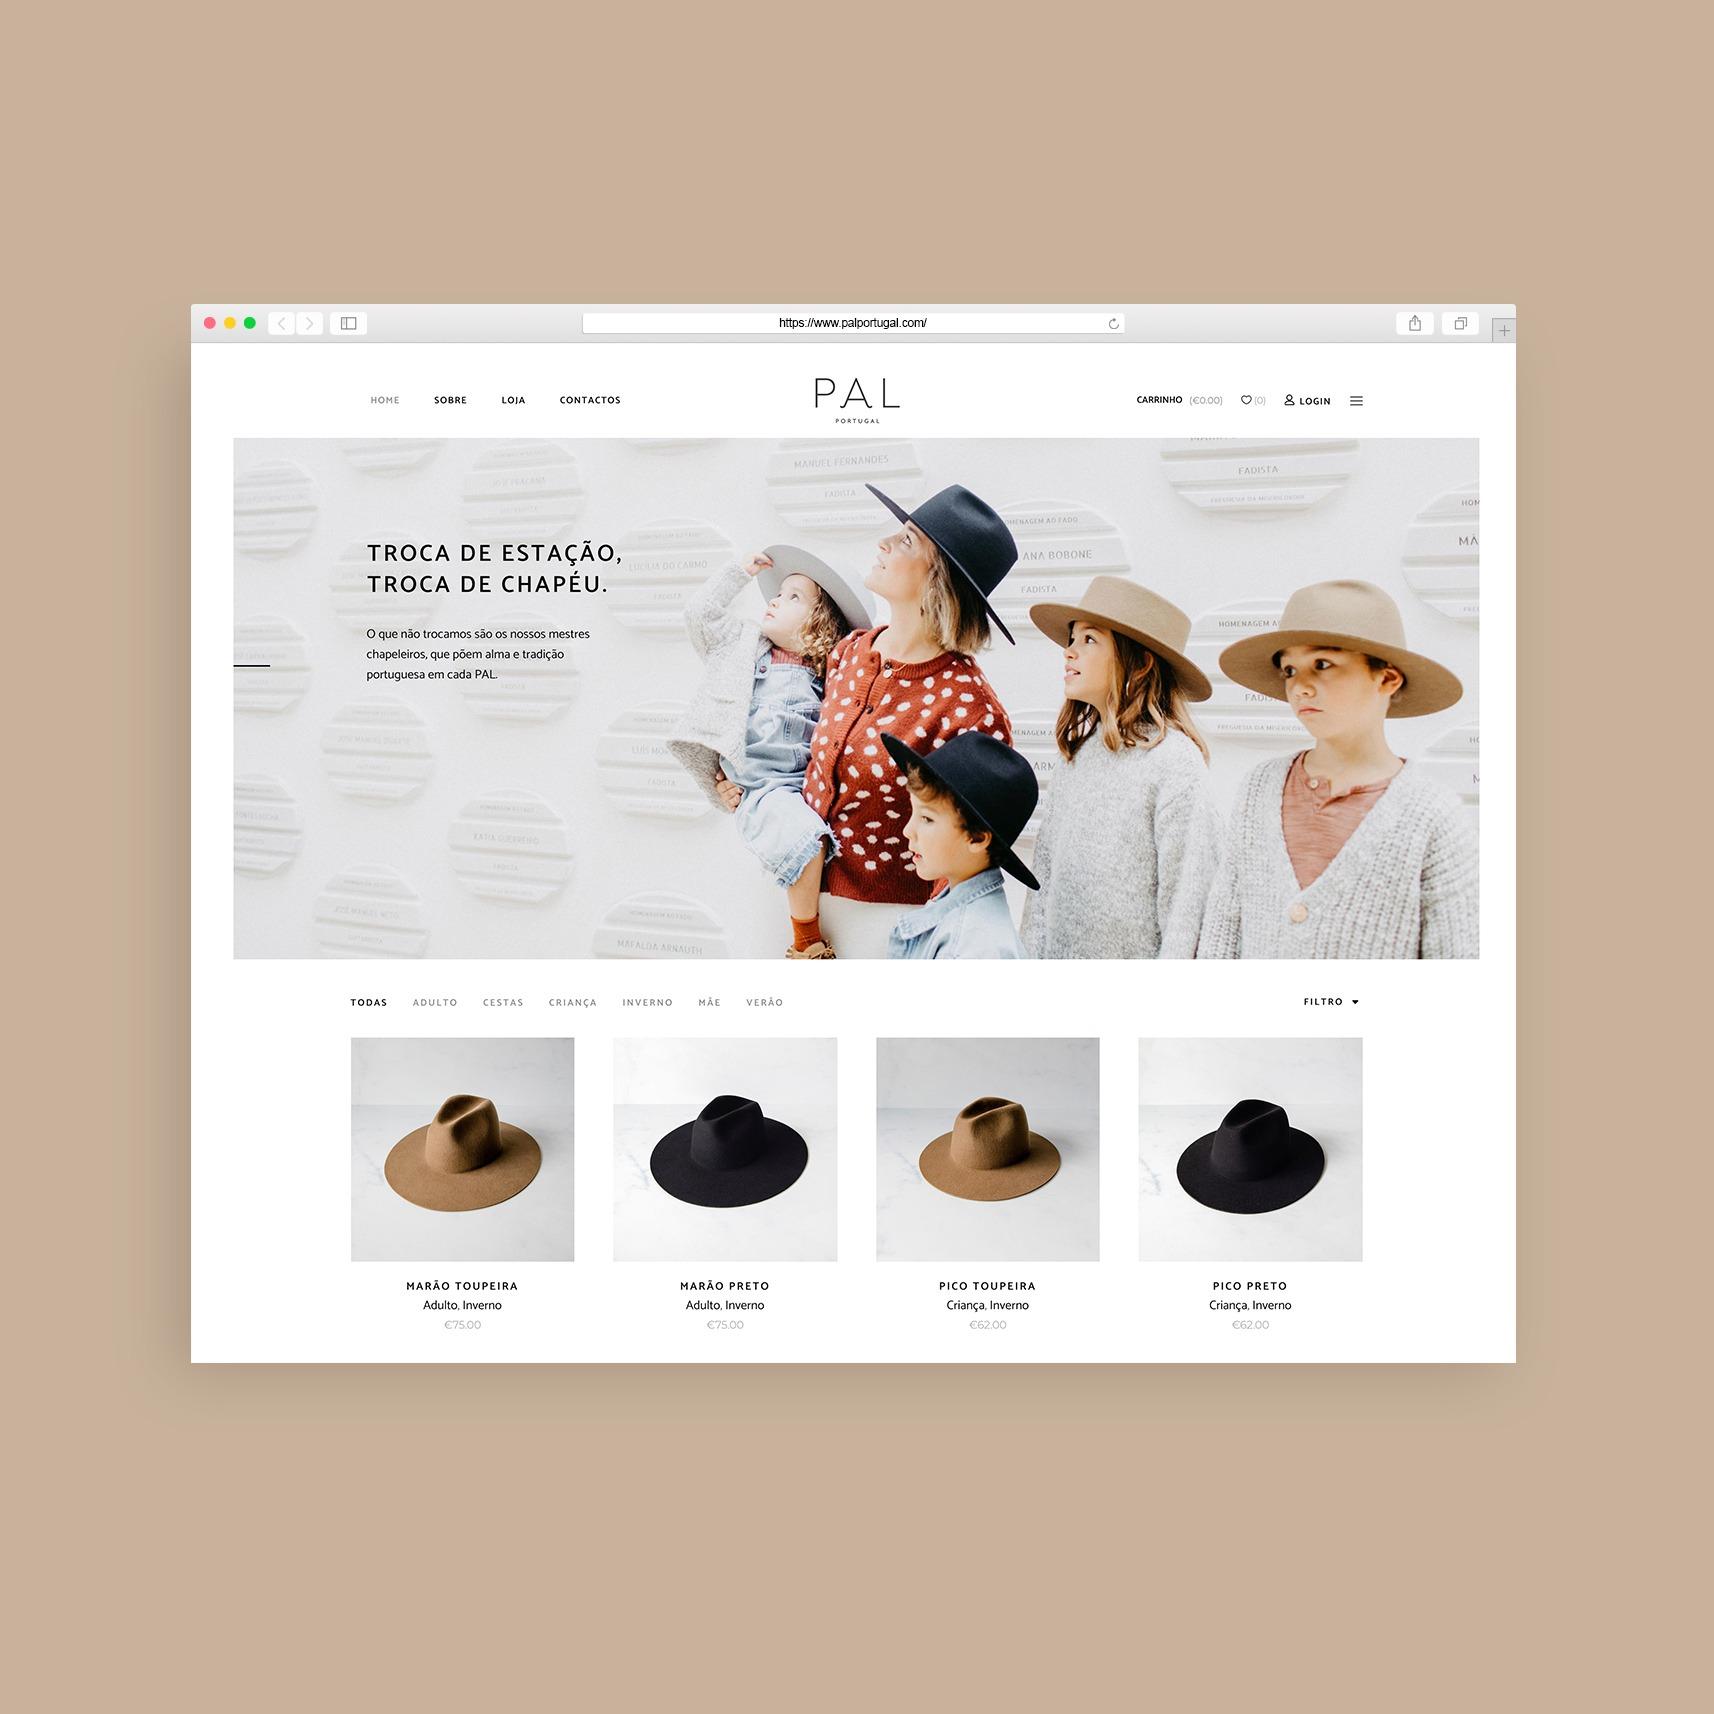 pal-loja-online-web-design